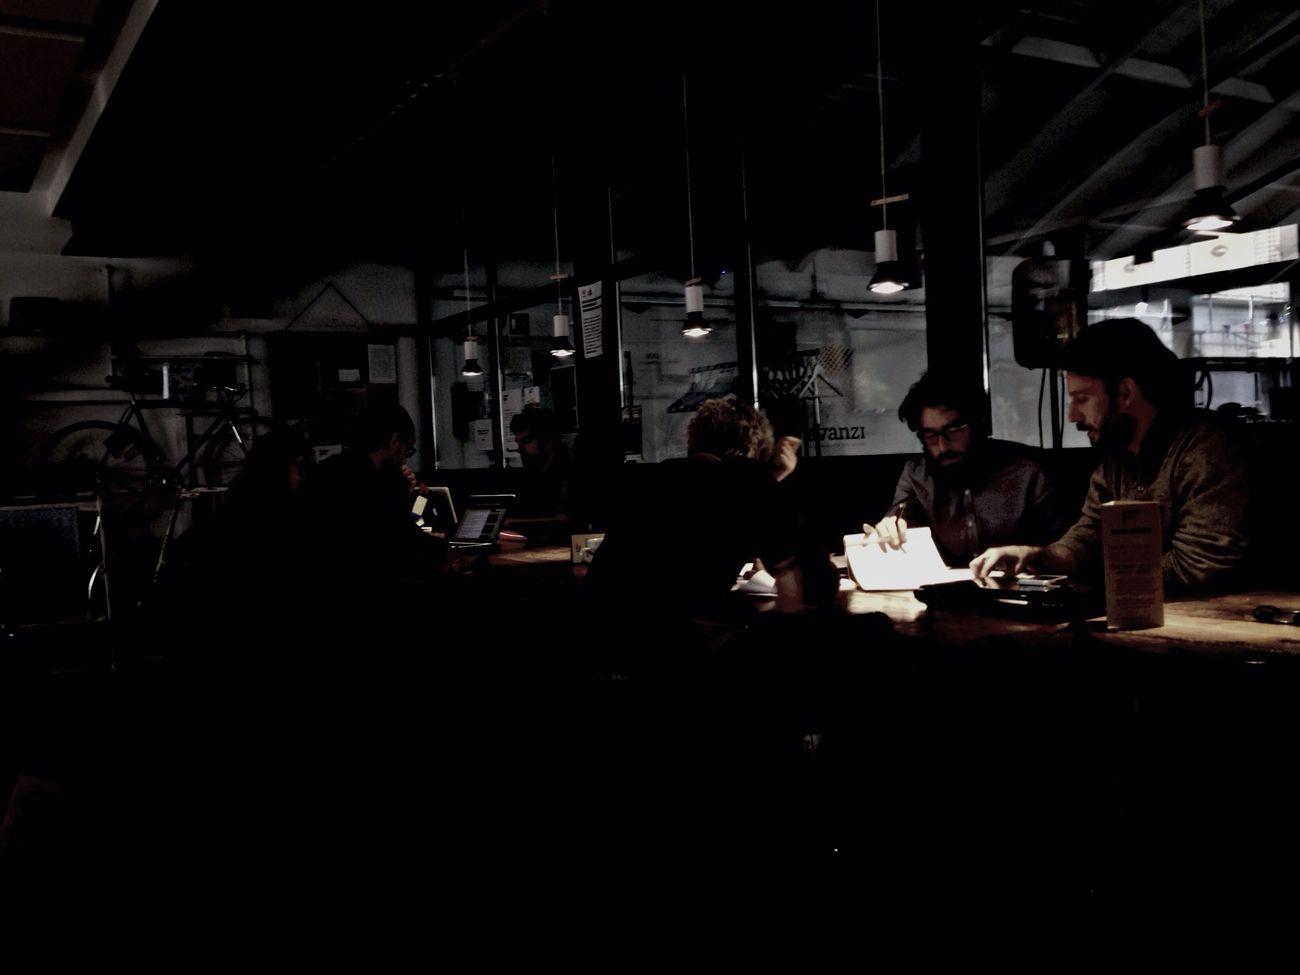 People Upcyclecafè